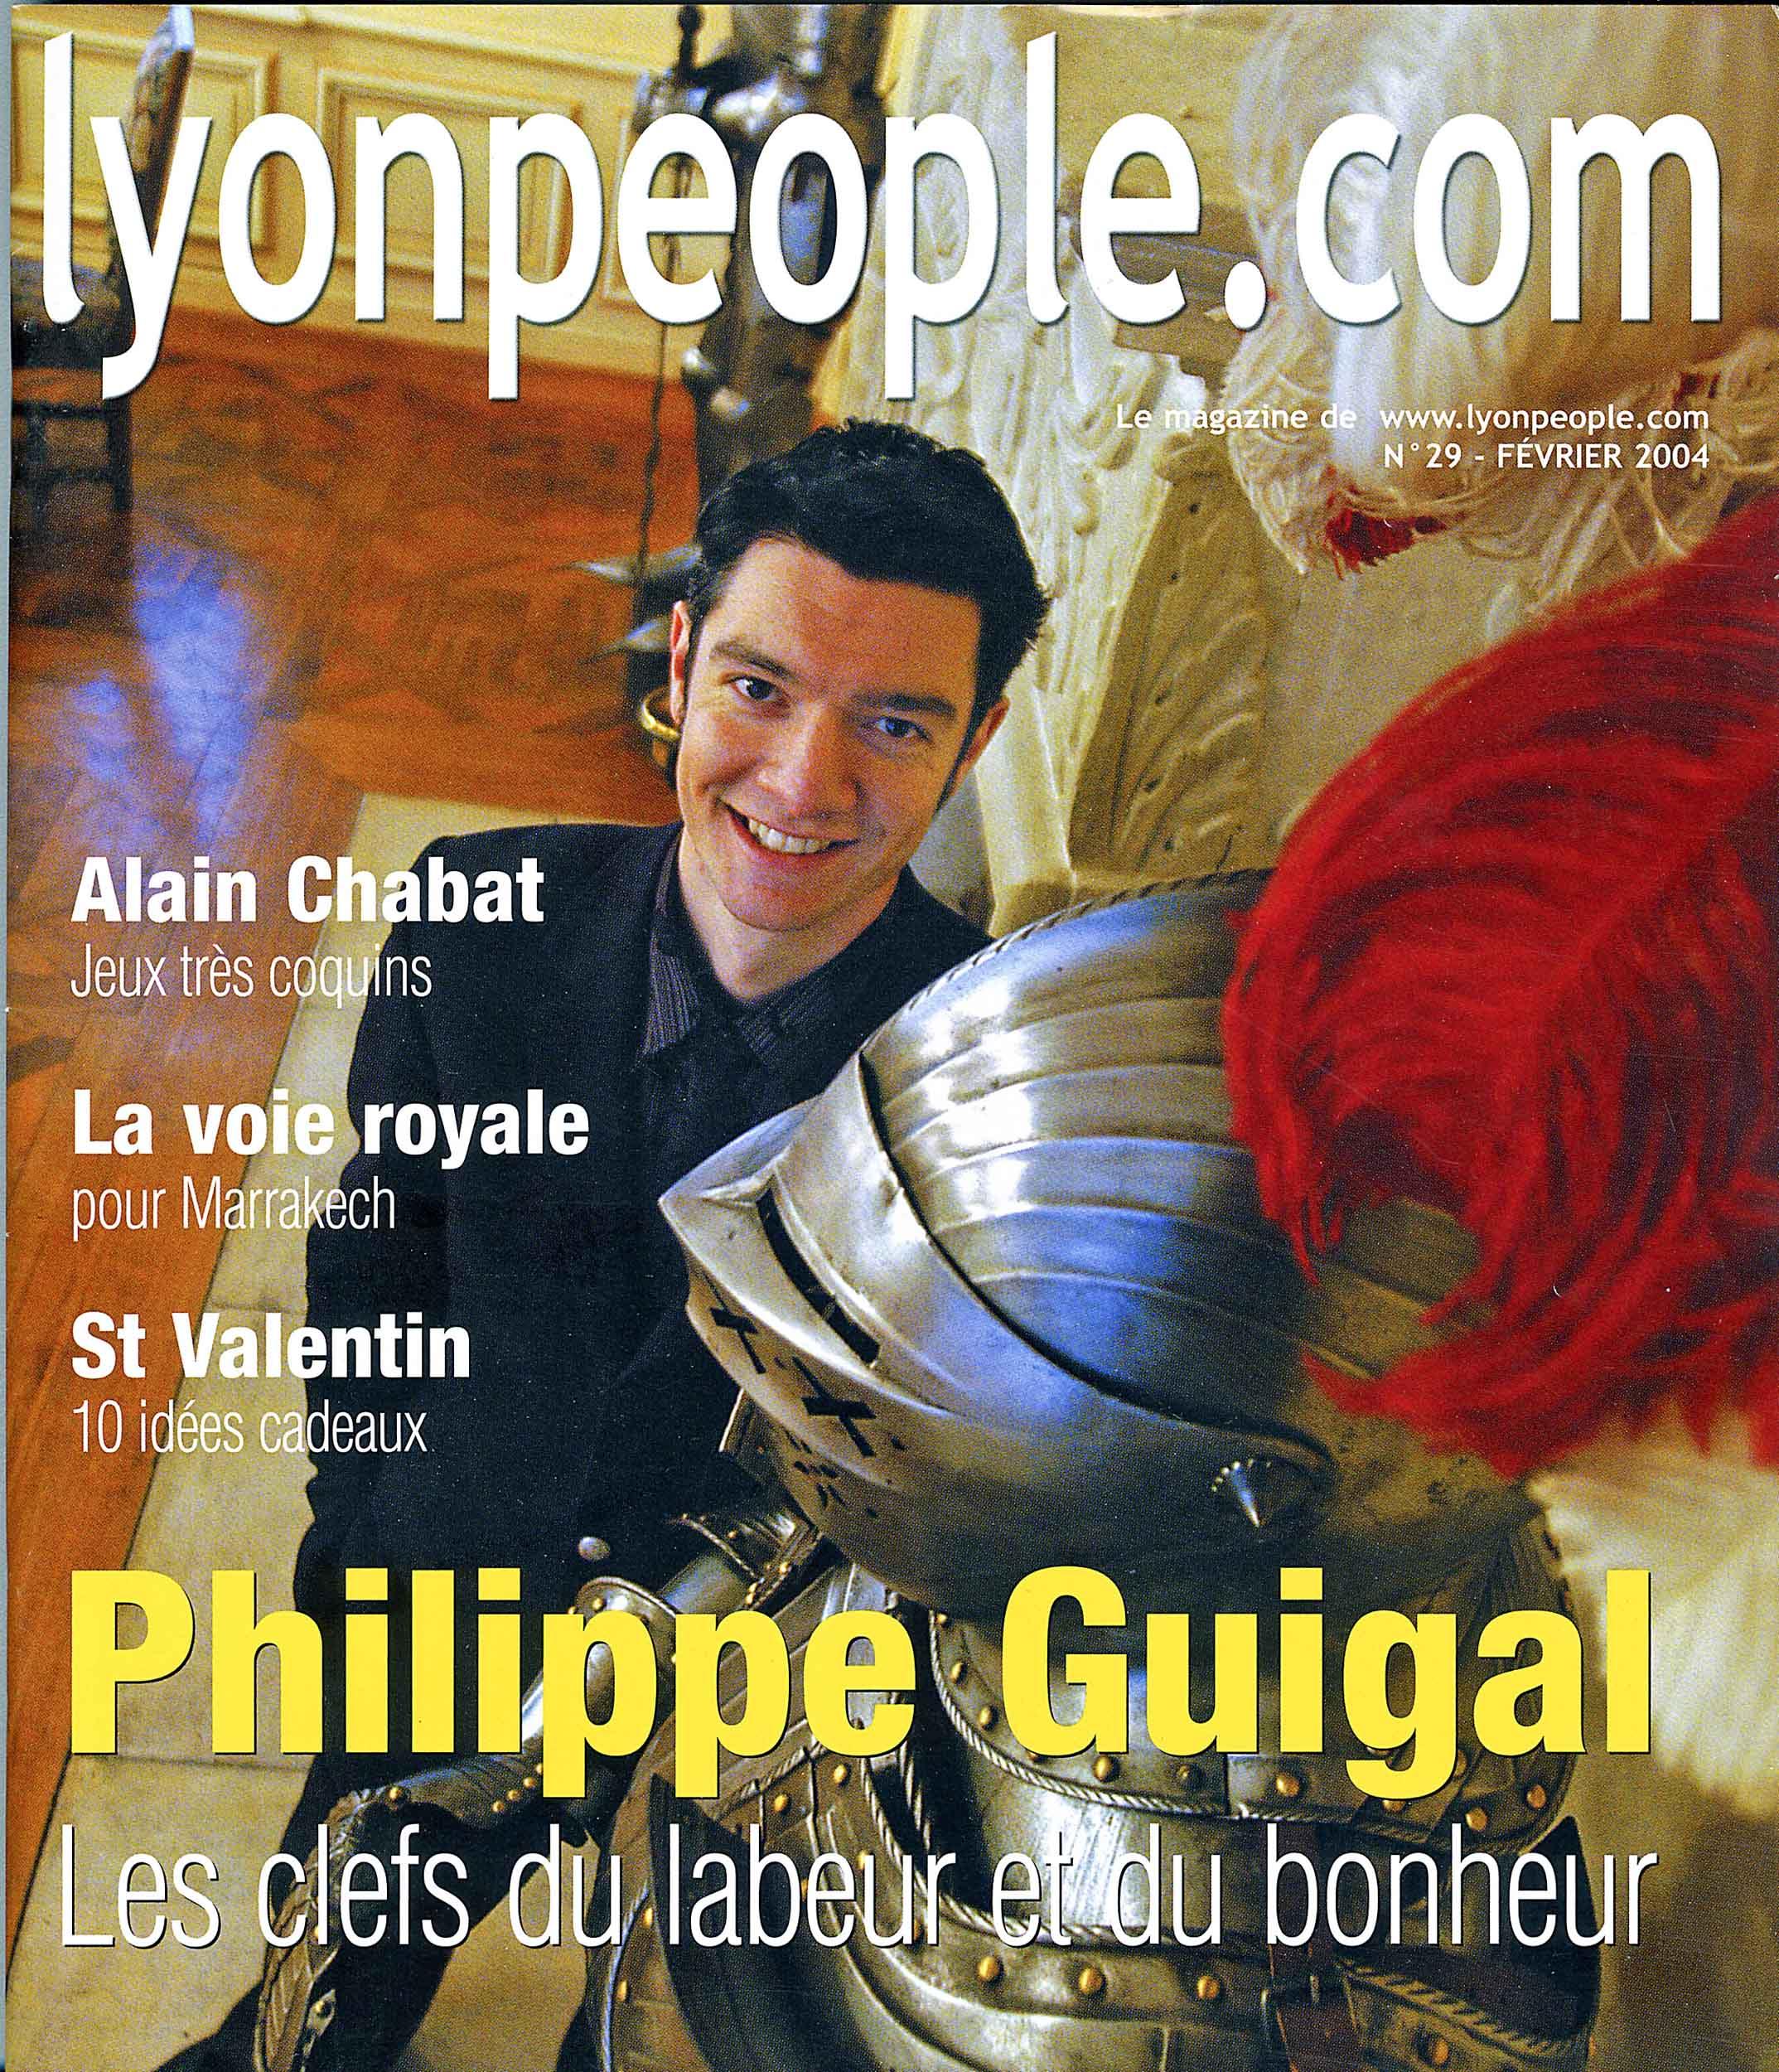 Philippe guigal-3.jpg